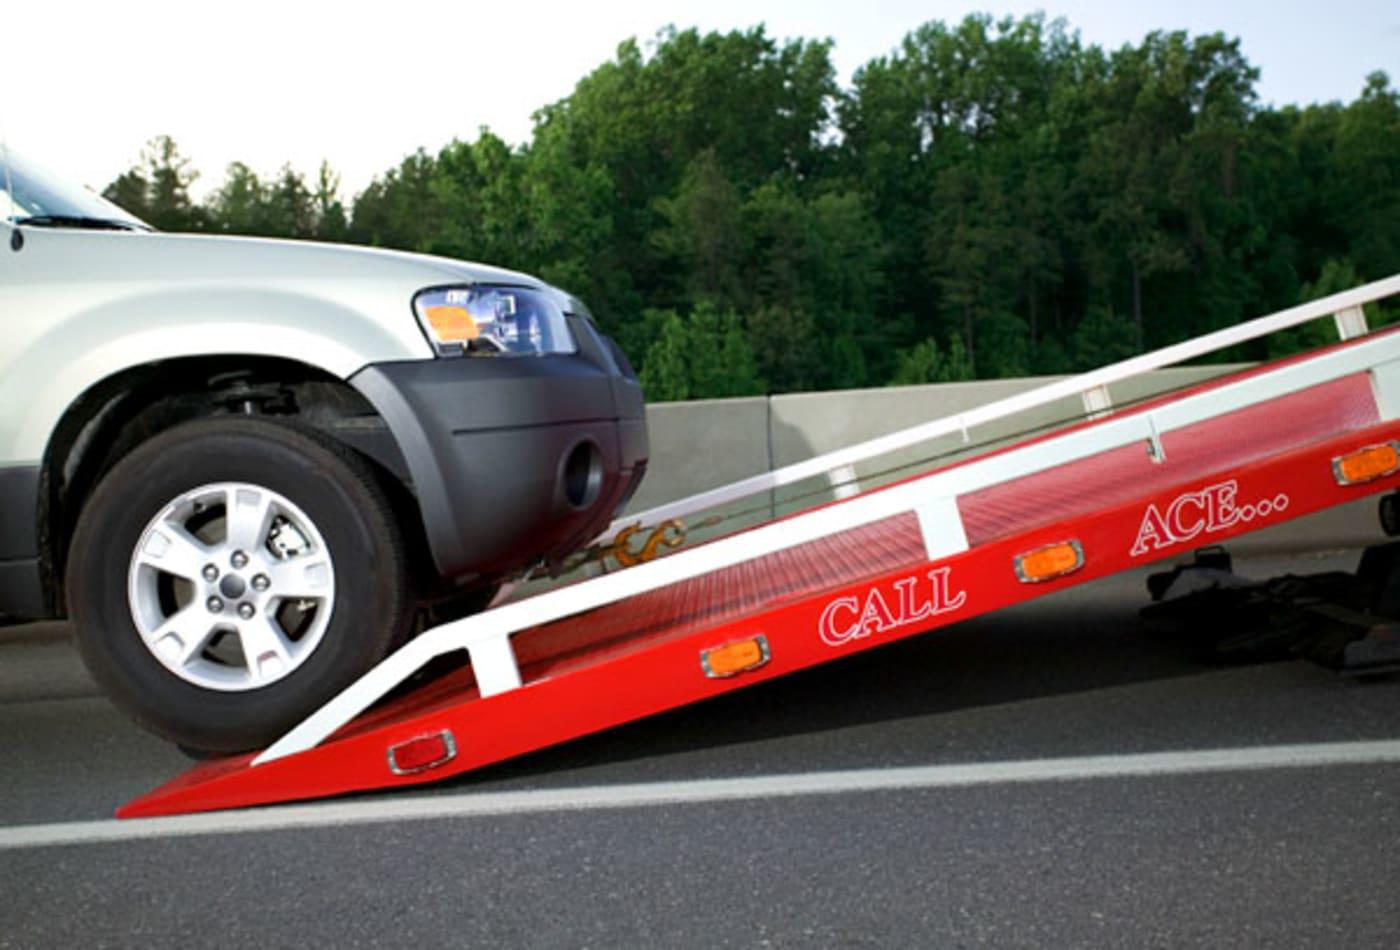 SS_Notorious_Car_Scams_Shipping.jpg